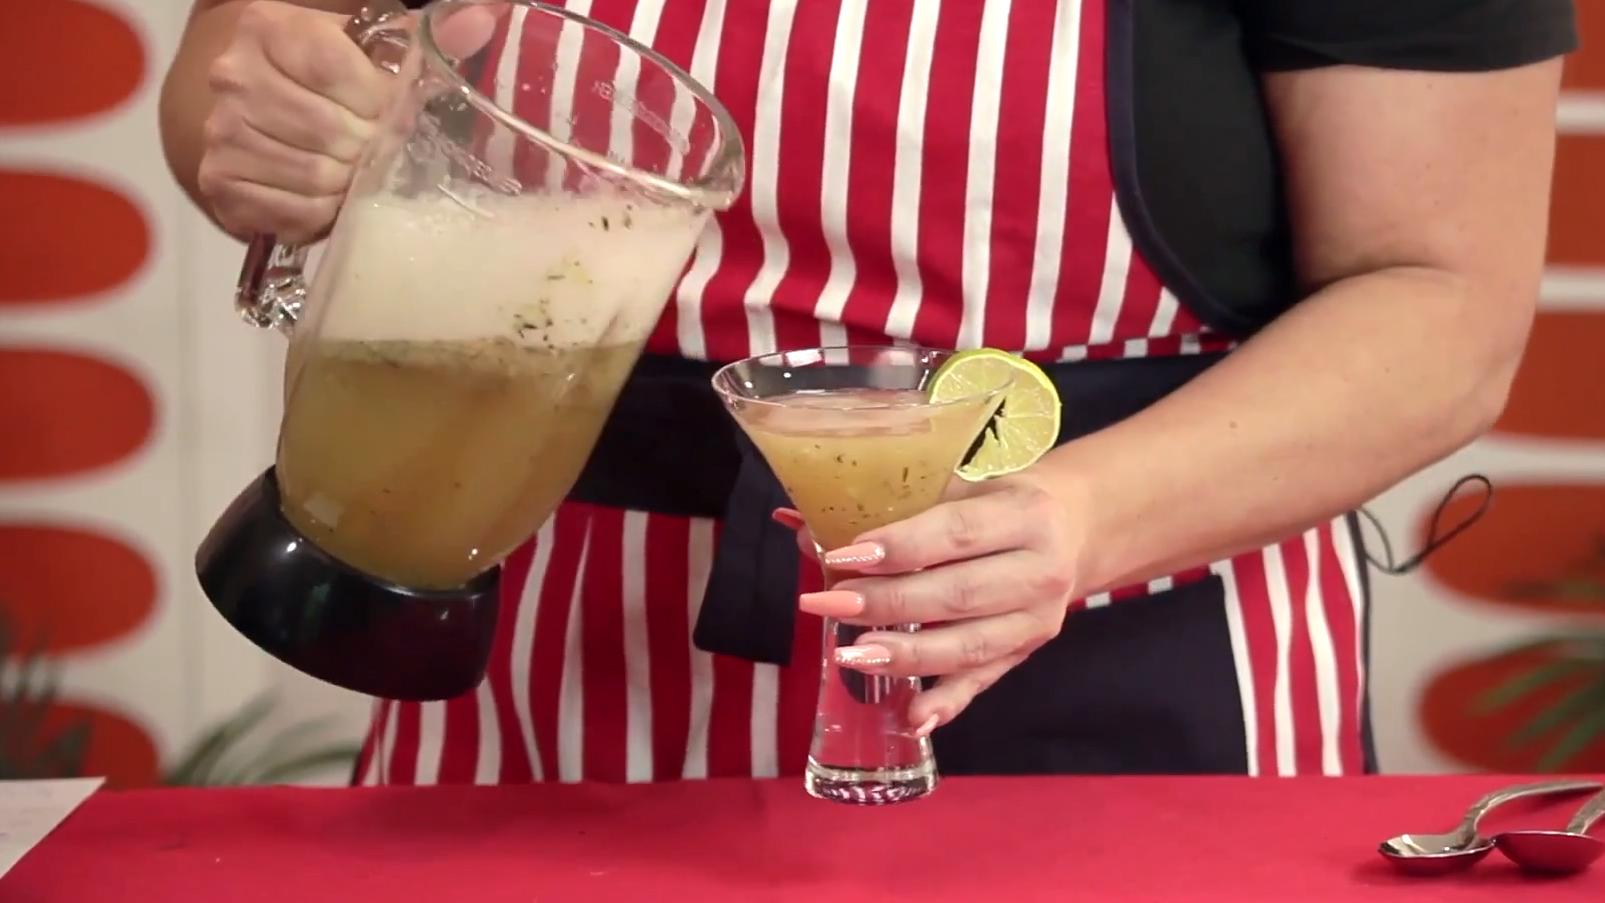 How to Make a Green Tea Mint Daiquiri